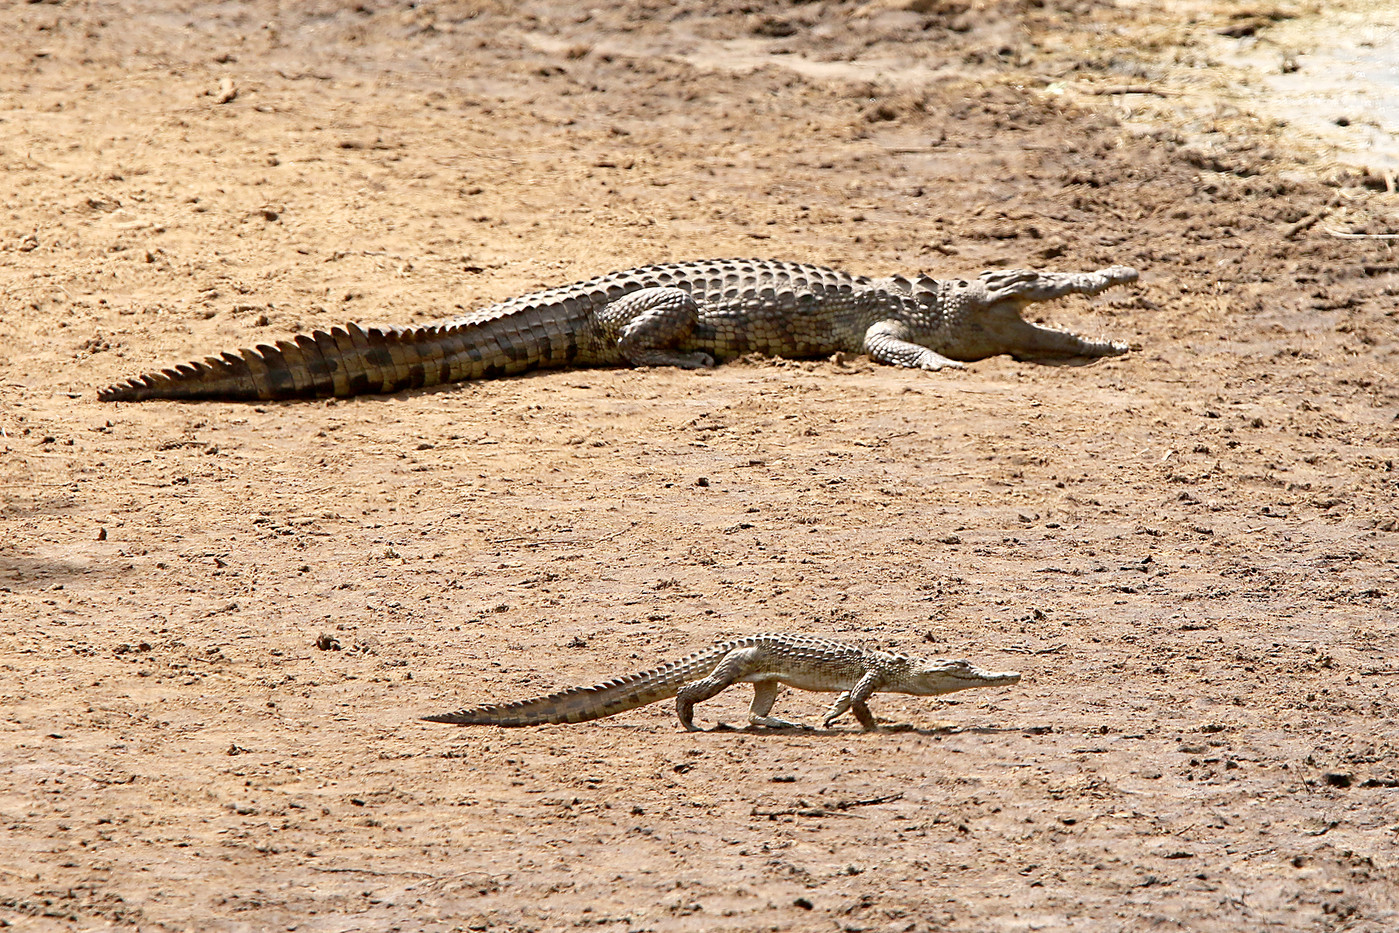 Baby Nile Crocodile in the Serengeti NP, Tanzania